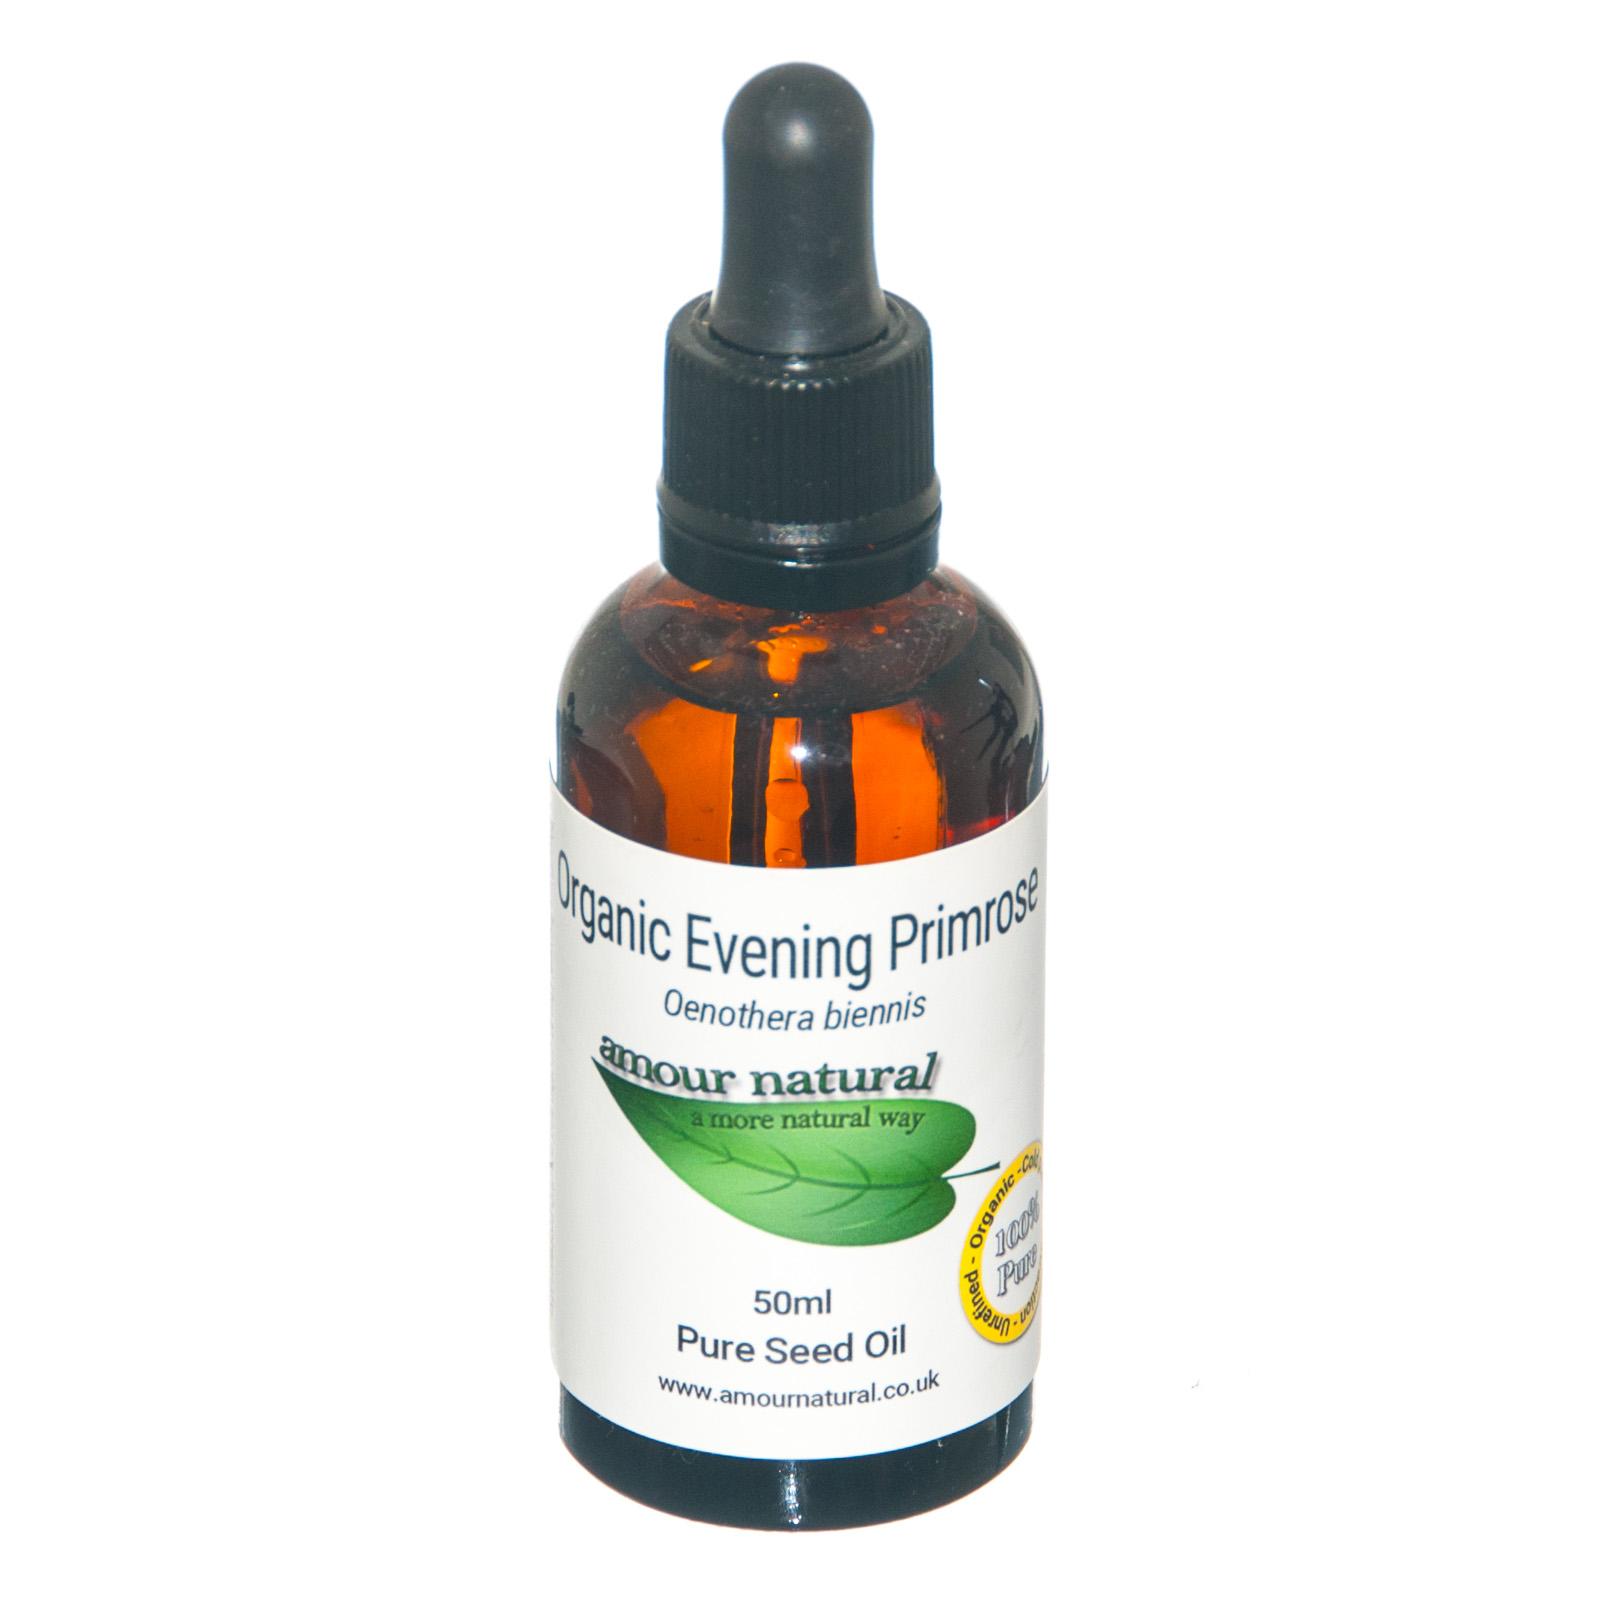 Organic Evening Primrose Oil 50ml